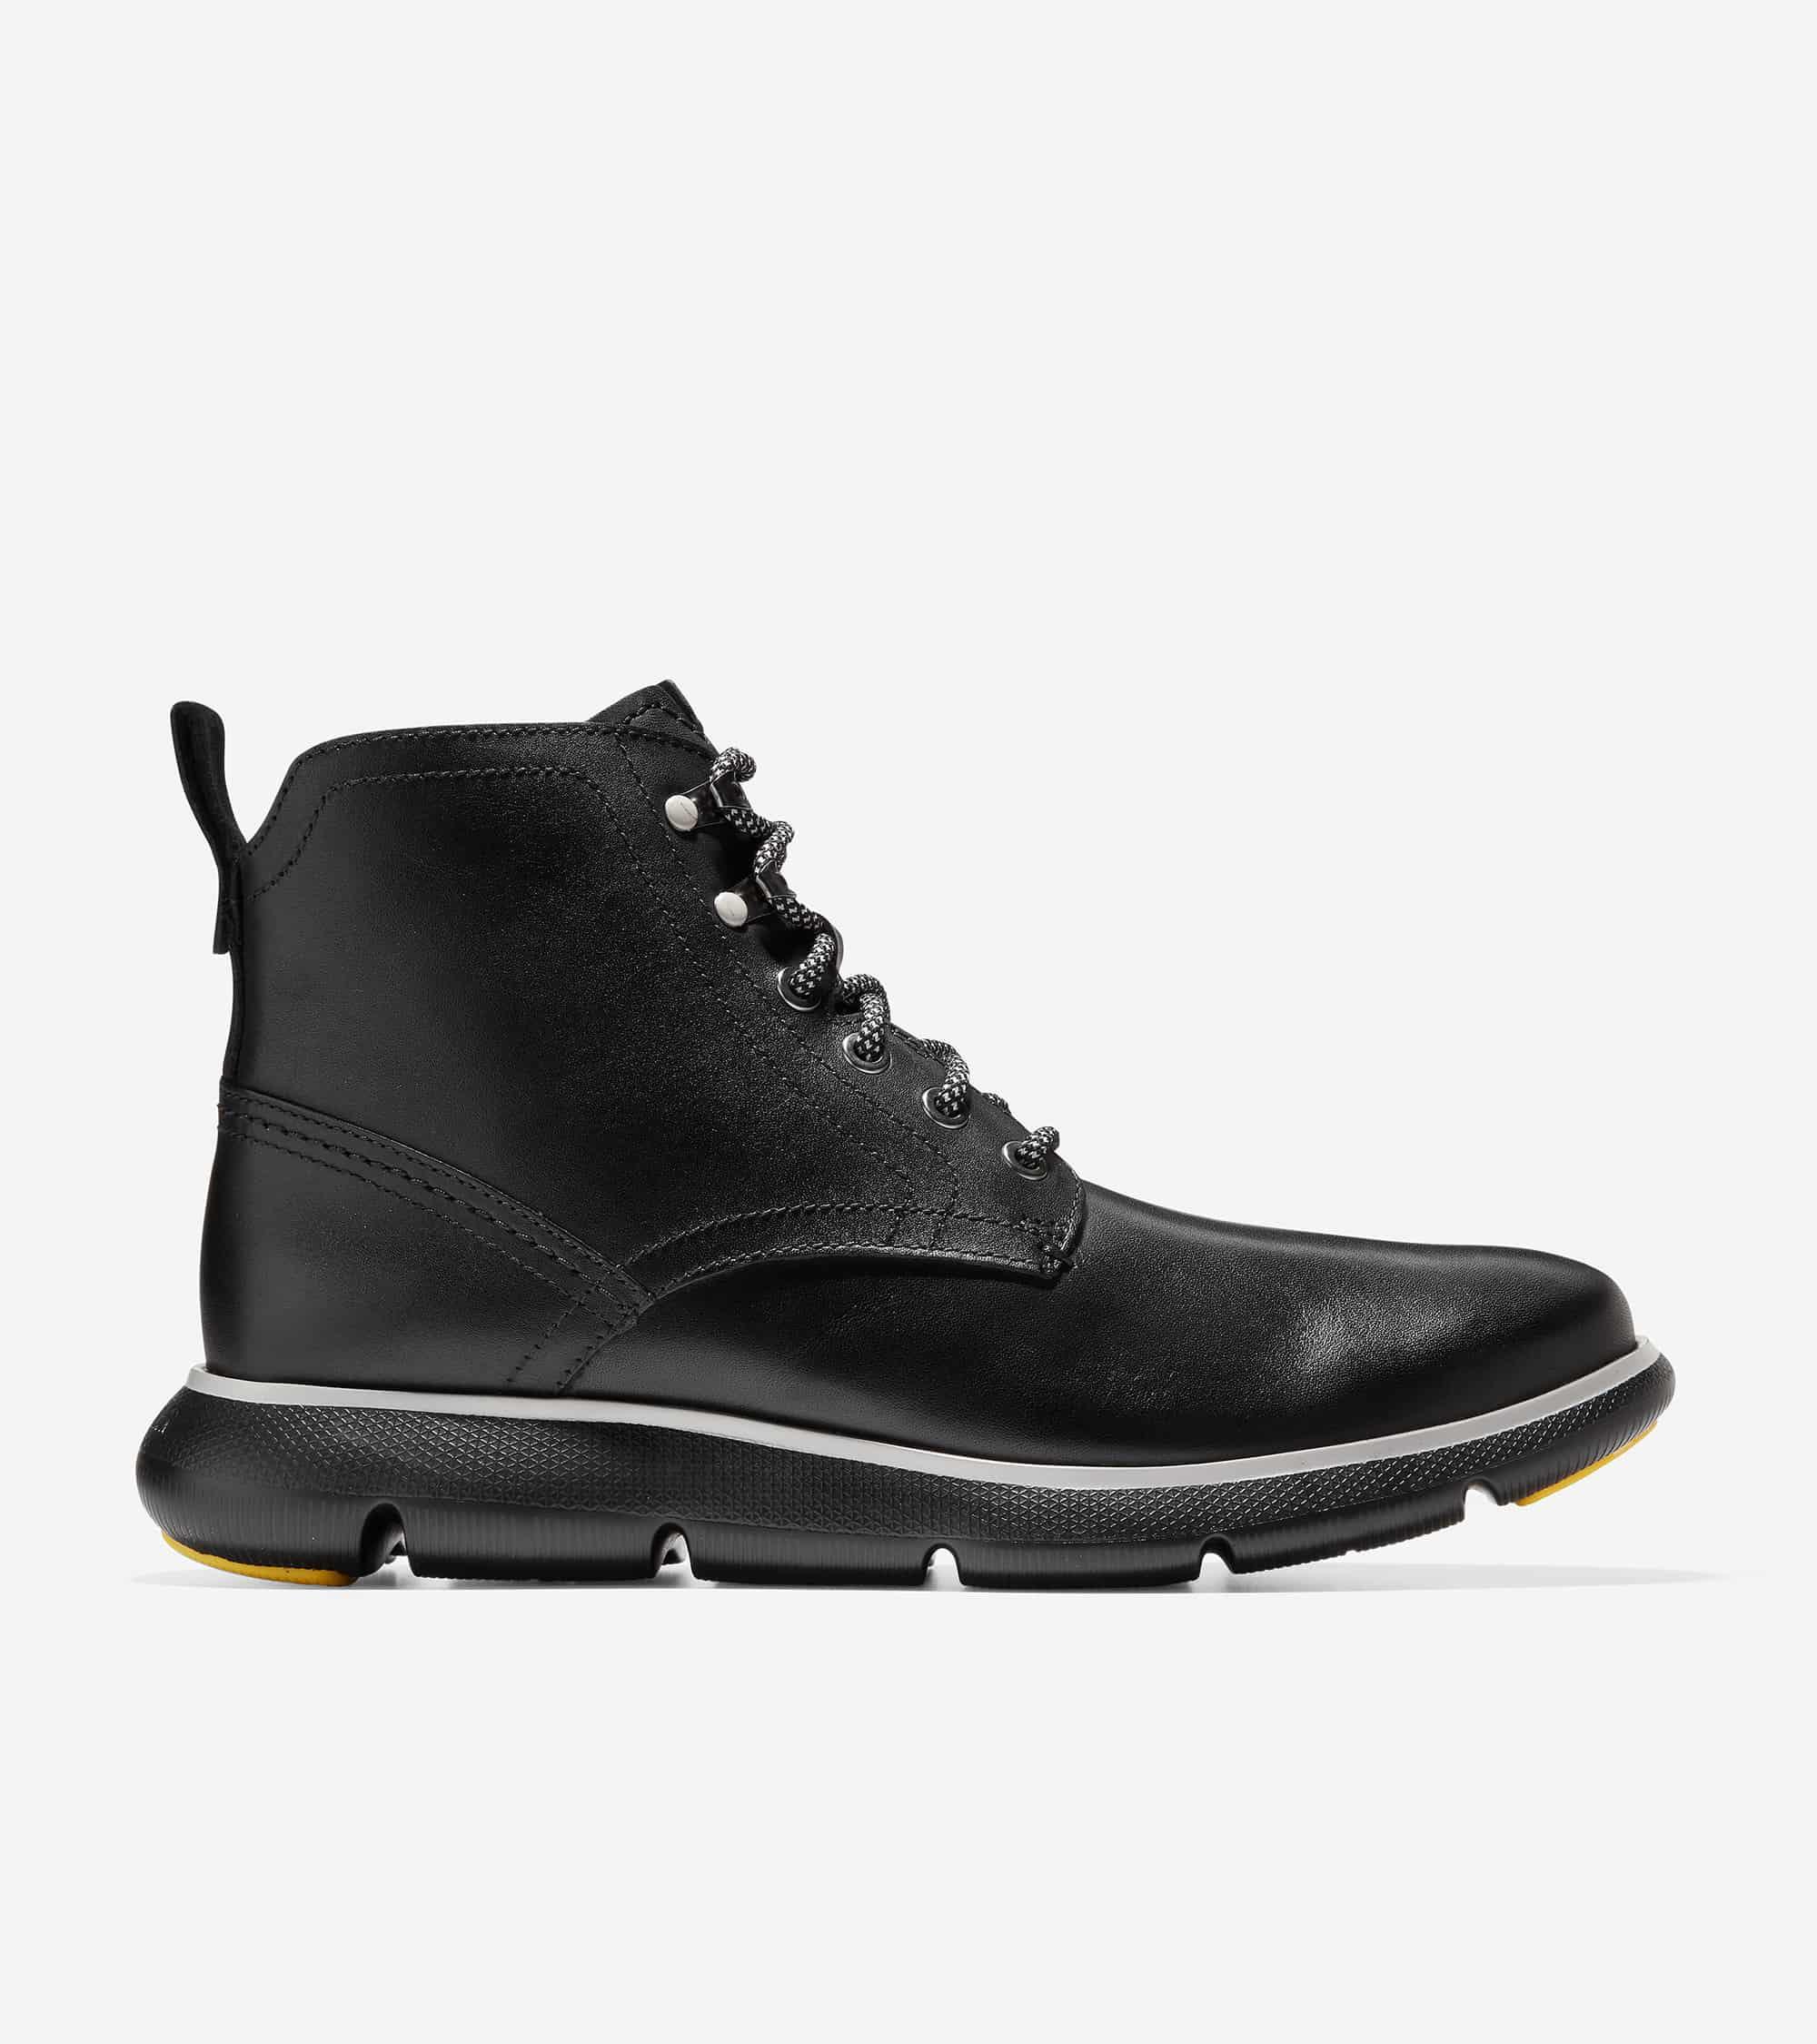 Cole Haan ZERØGRAND Omni City Boot Black/Black